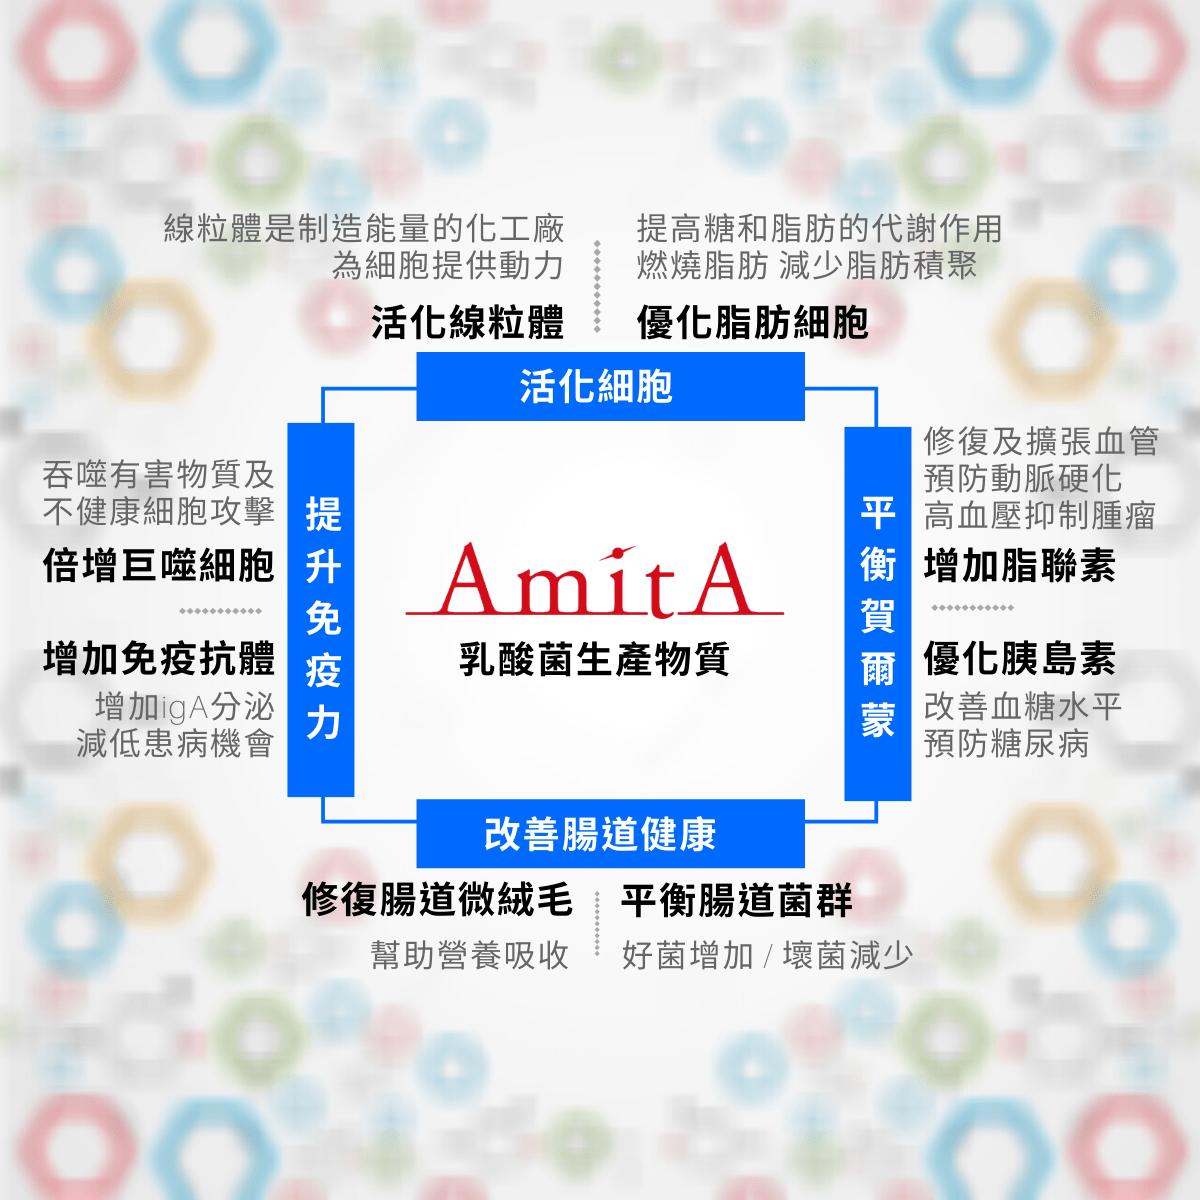 AmitA乳酸菌生產物質功效